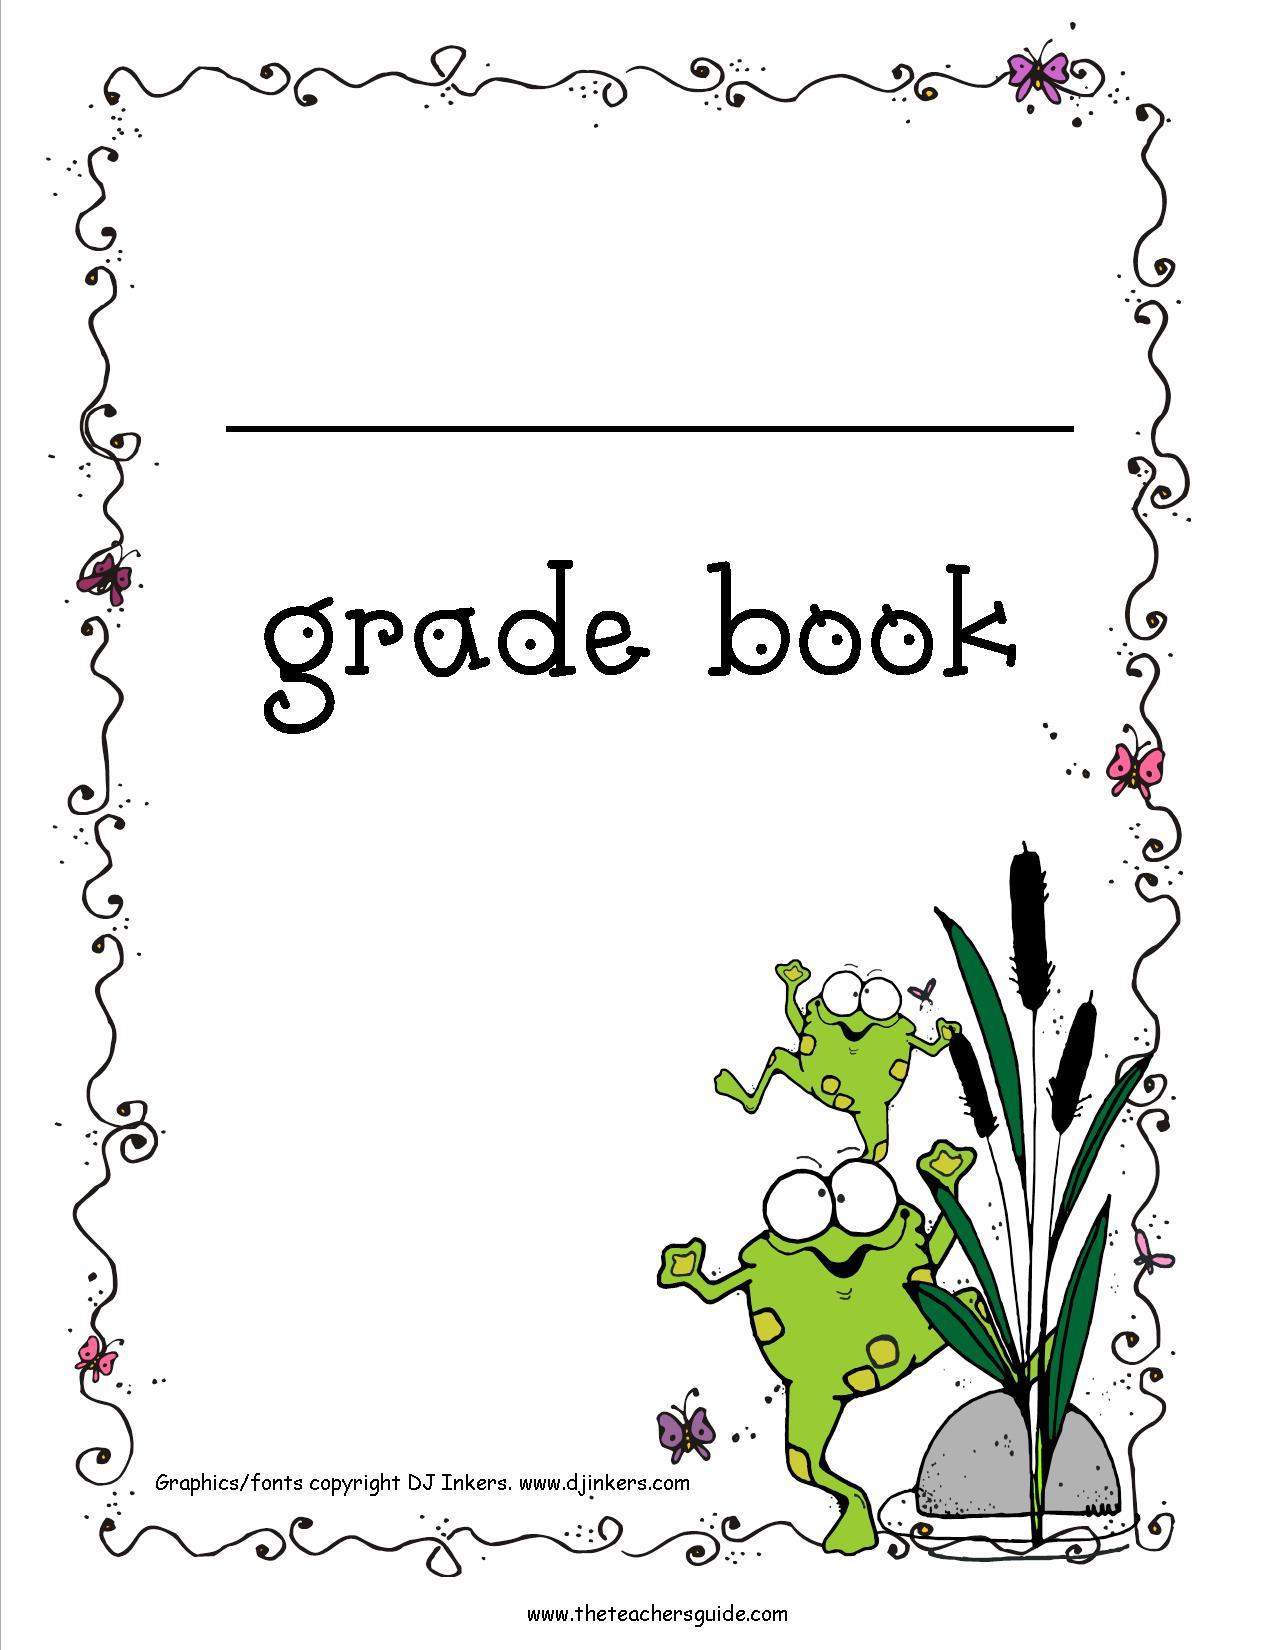 Free Printable Grade Books - Free Printable Books